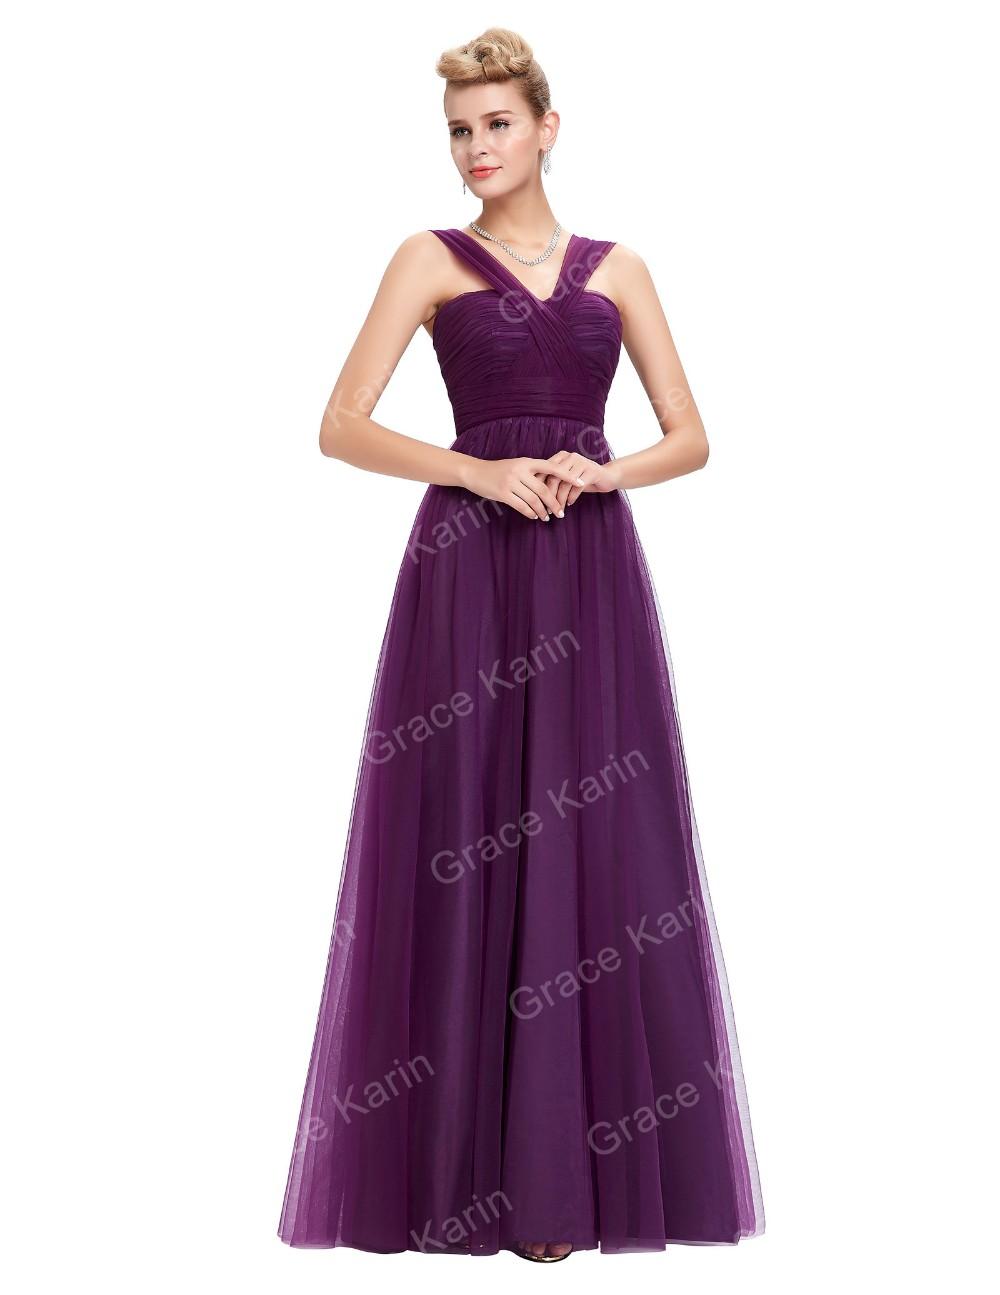 Grace Karin Elegant Latest Party Gowns Designs Sleeveless Purple ...